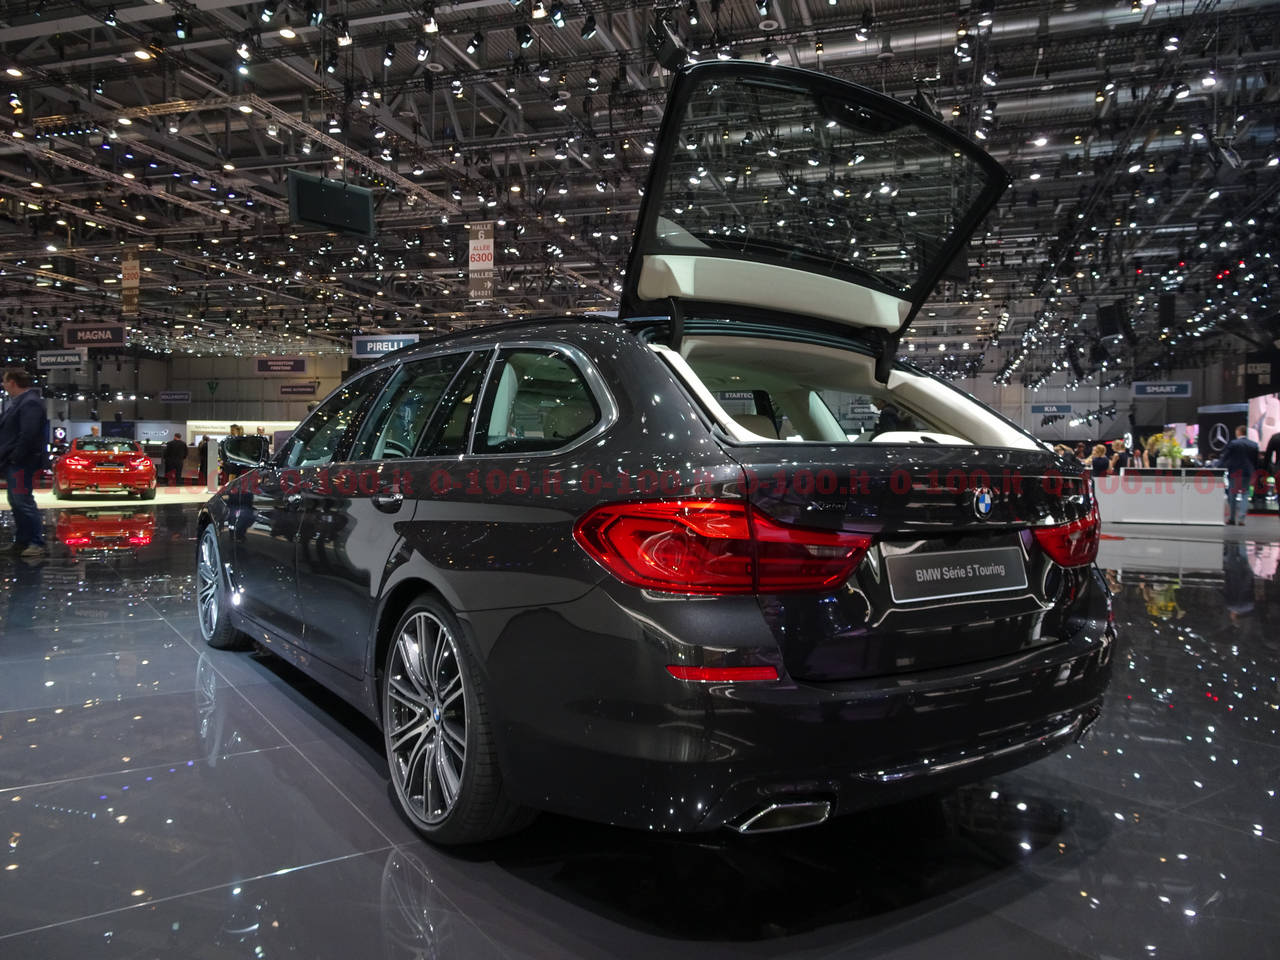 Ginevra-geneva-geneve-2017-BMW_Serie-5-Touring_0-100_19